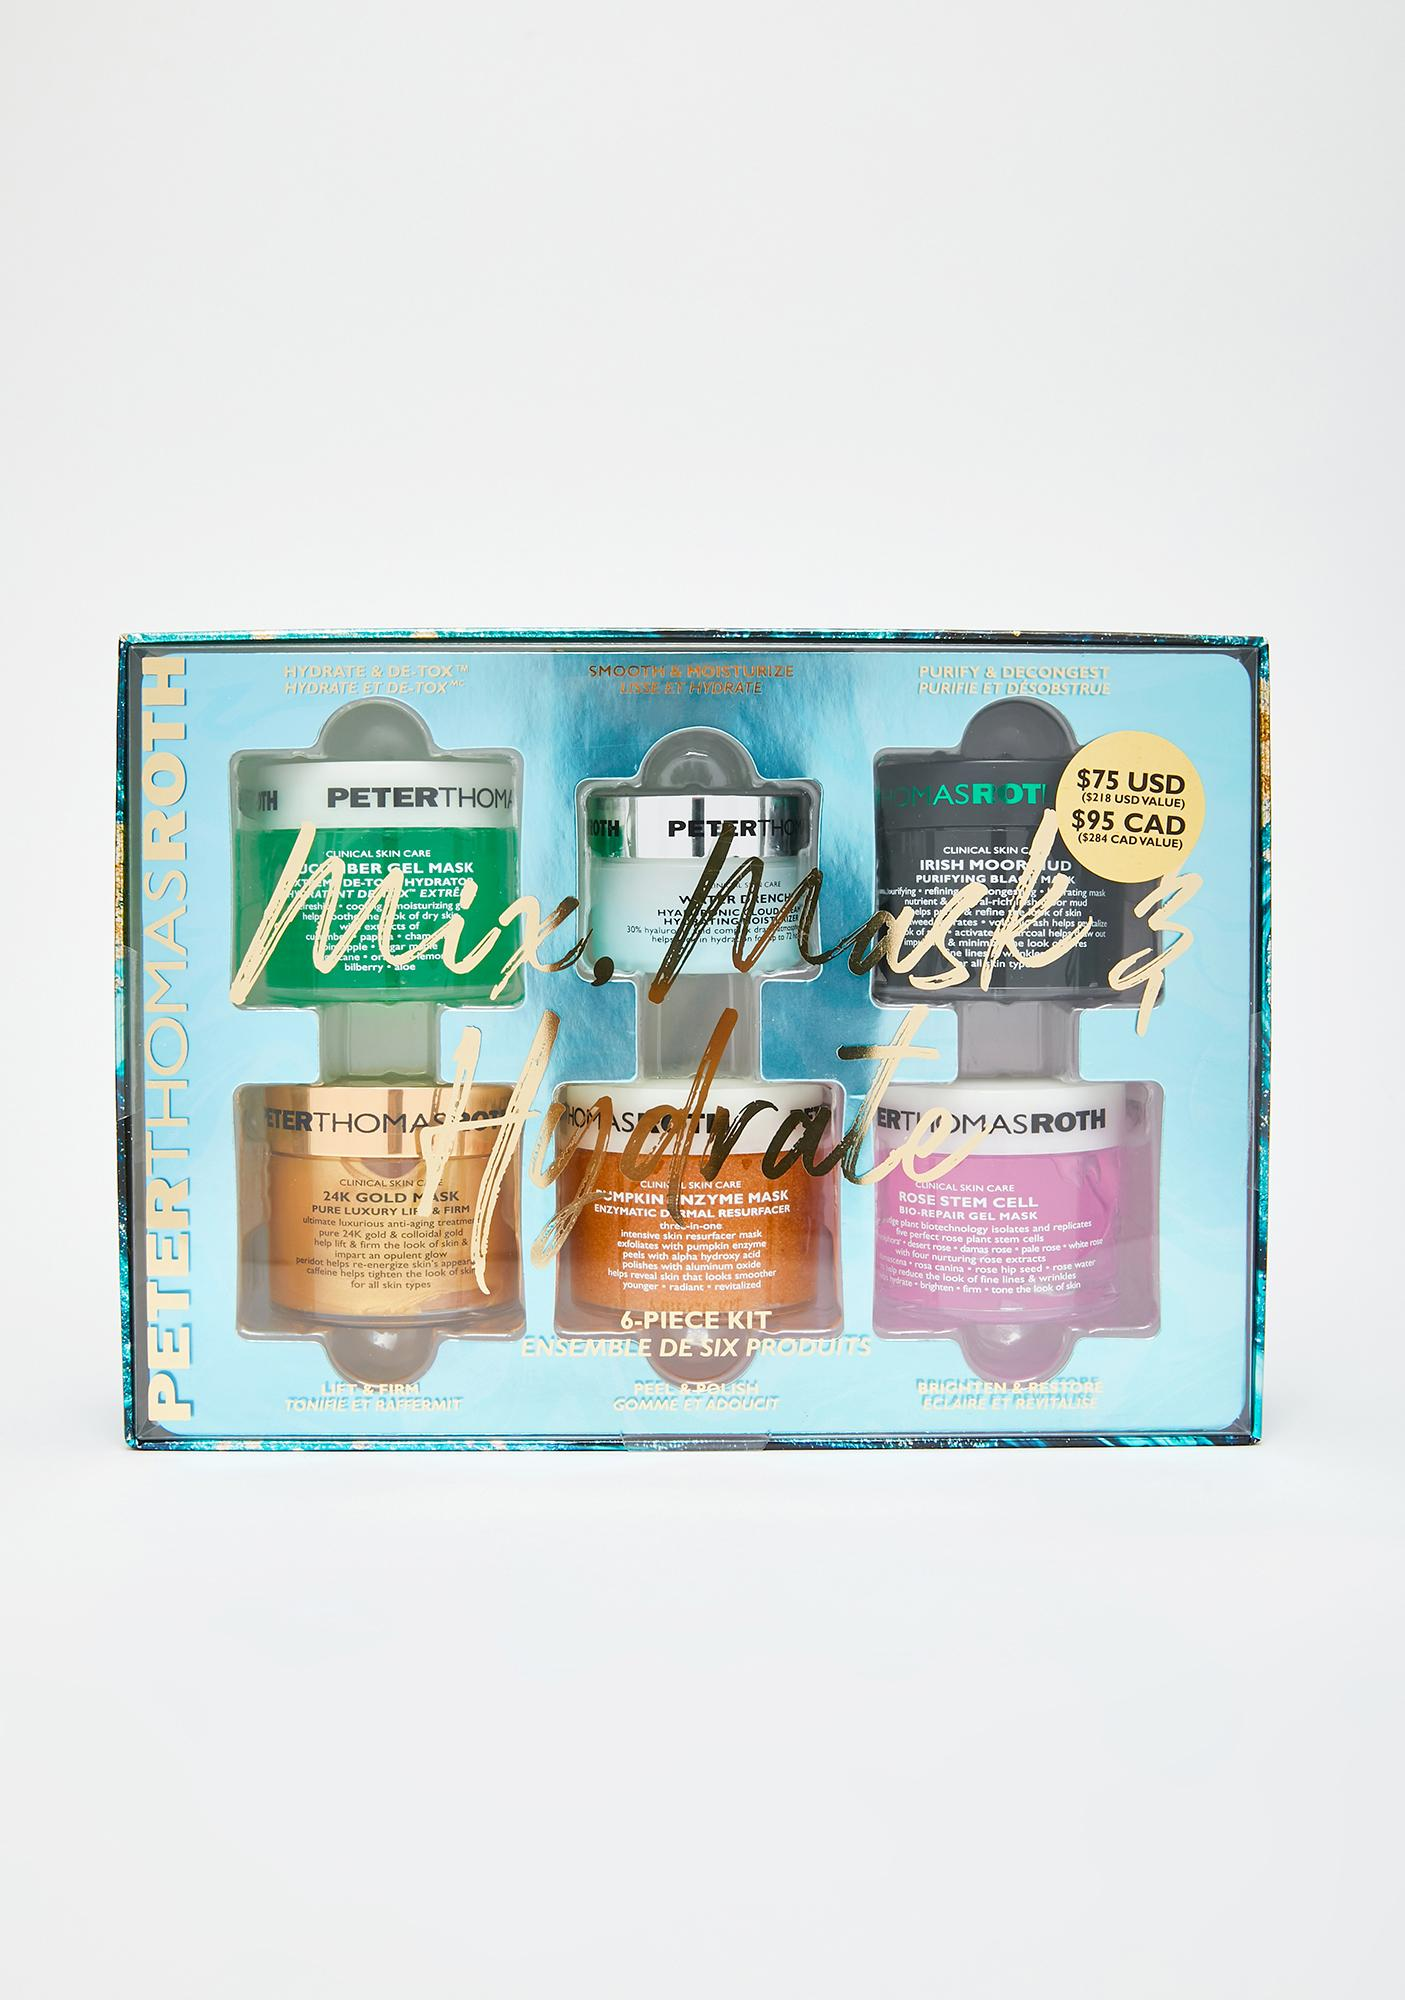 Peter Thomas Roth Mix Mask & Hydrate 6-Piece Kit